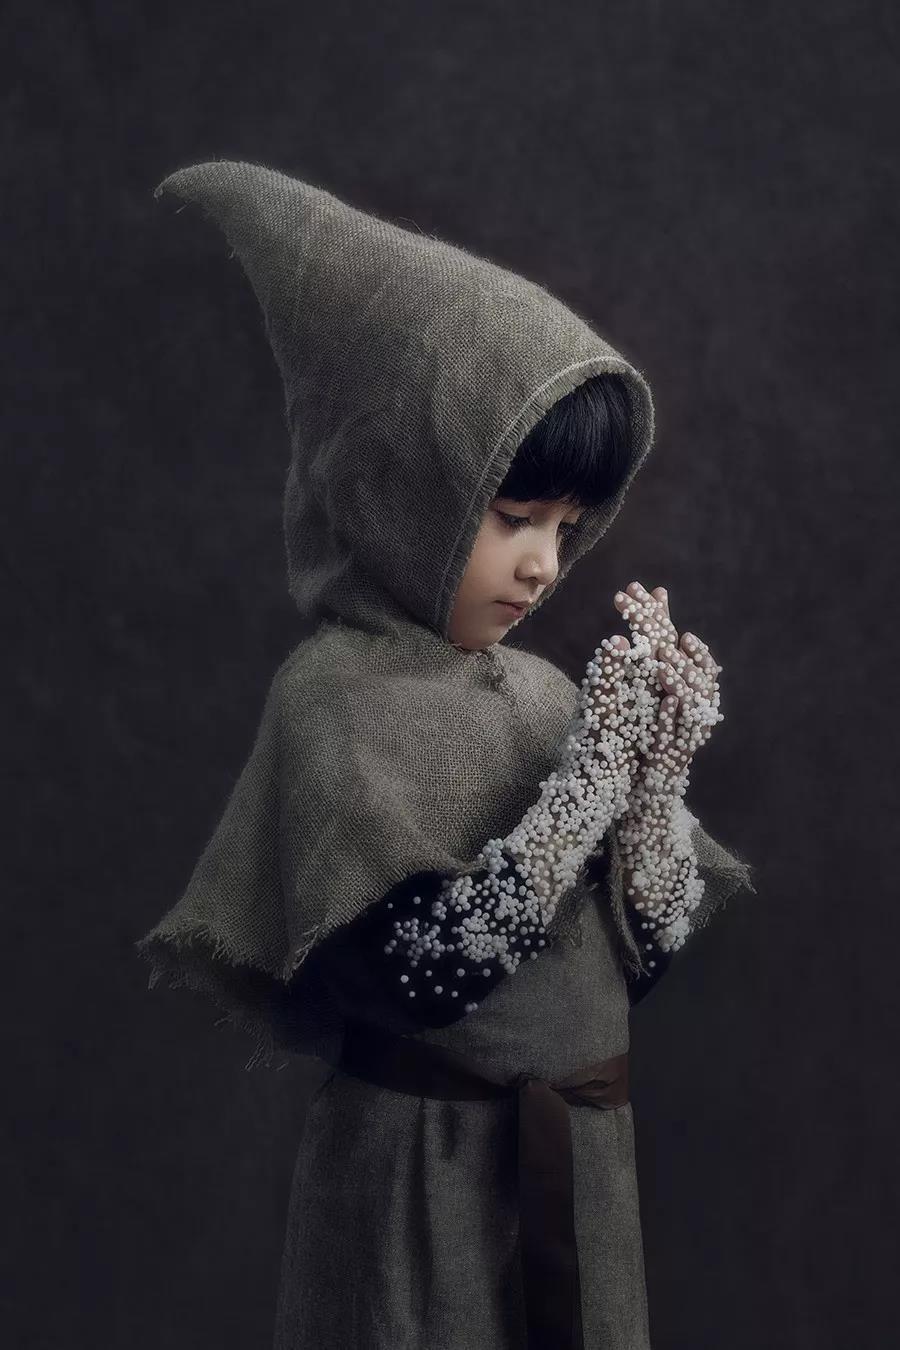 儿童艺术照